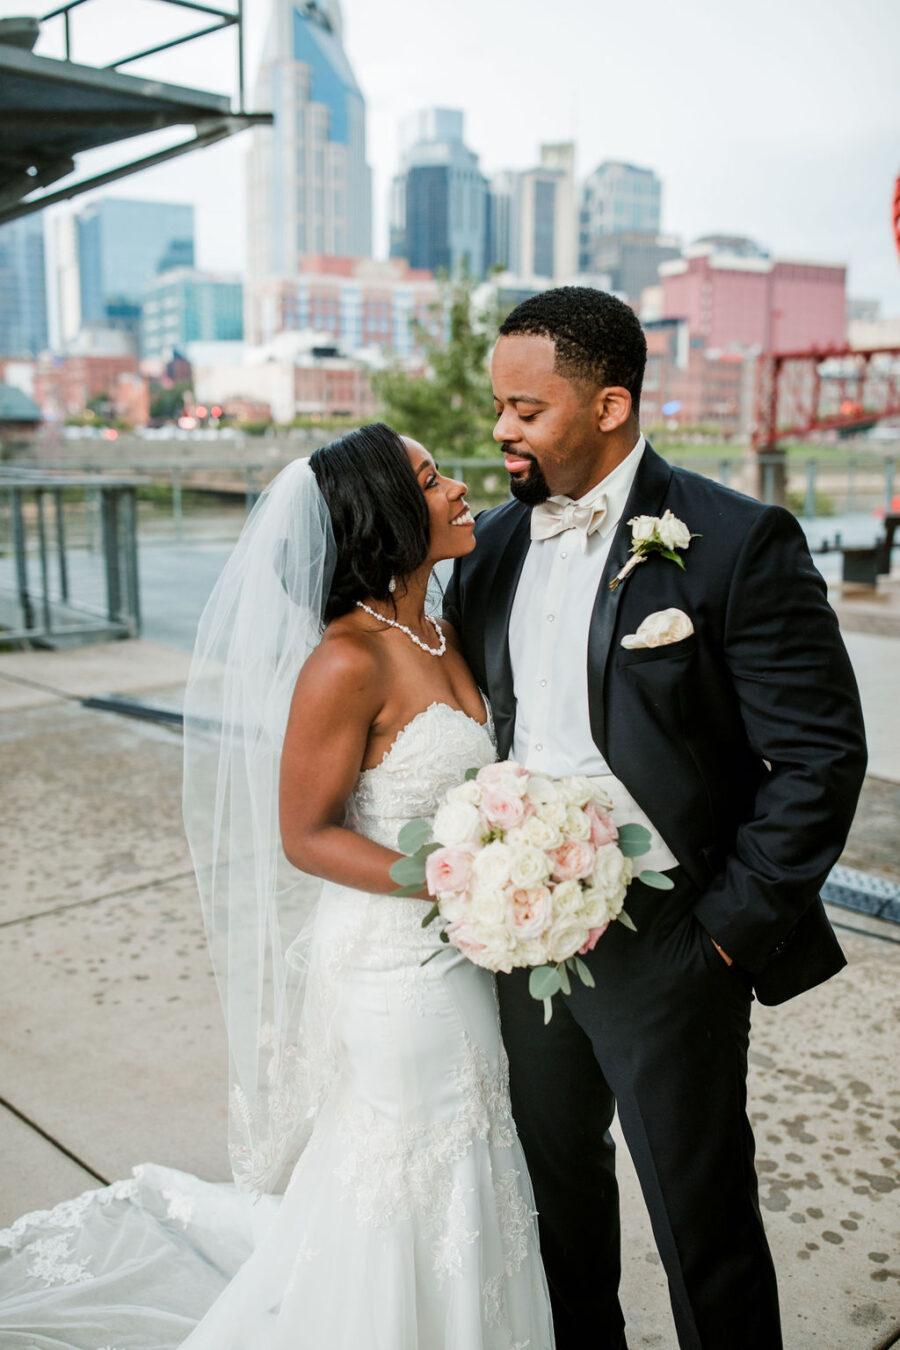 John Myers Photography Nashville Wedding | Nashville Bride Guide